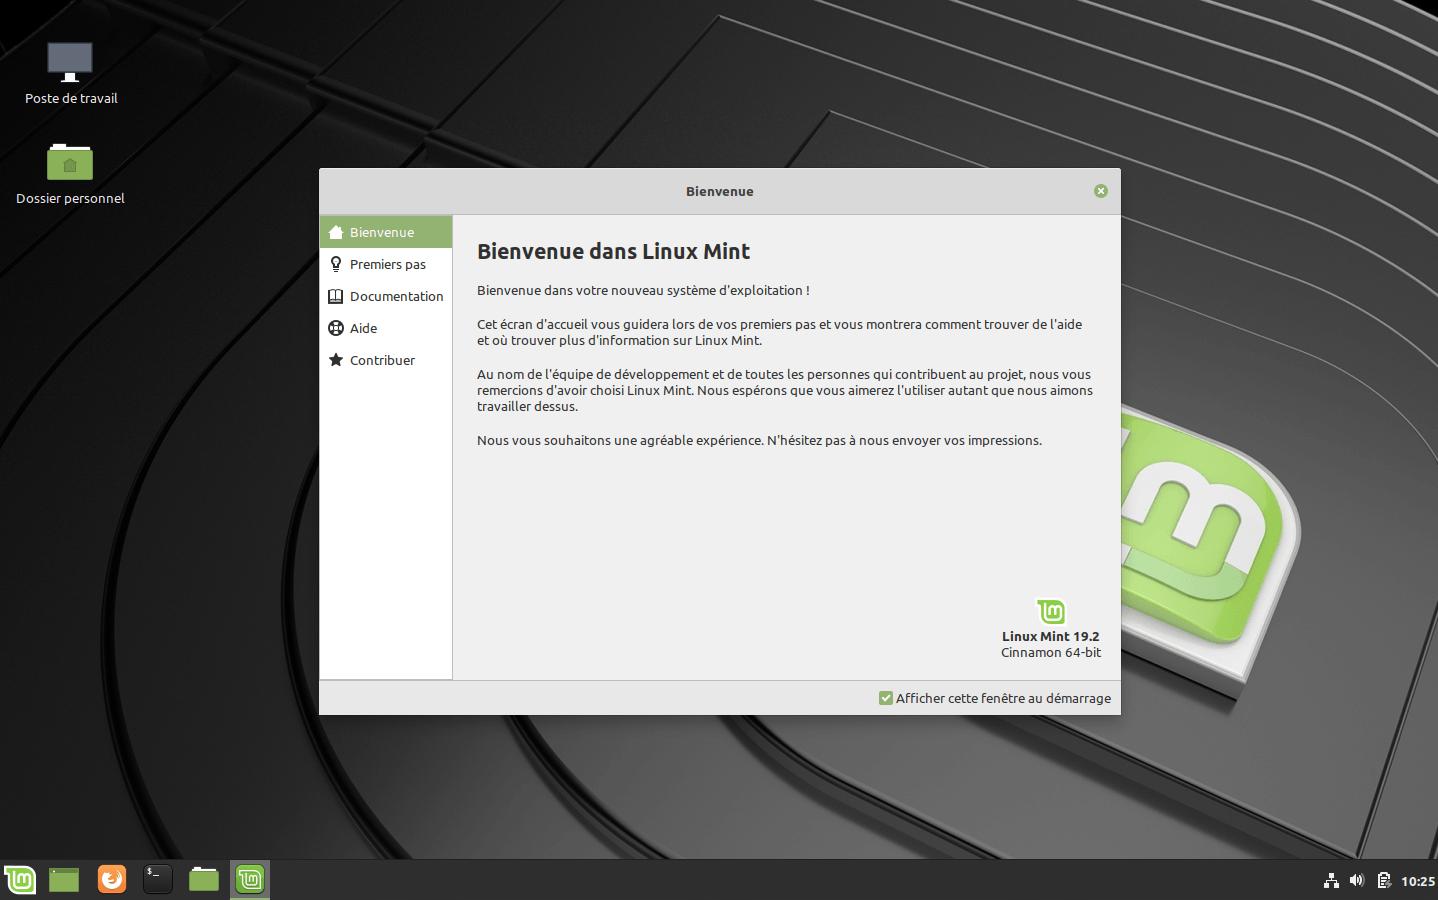 Установка тор браузера в линукс минт hyrda вход tor browser in linux hyrda вход